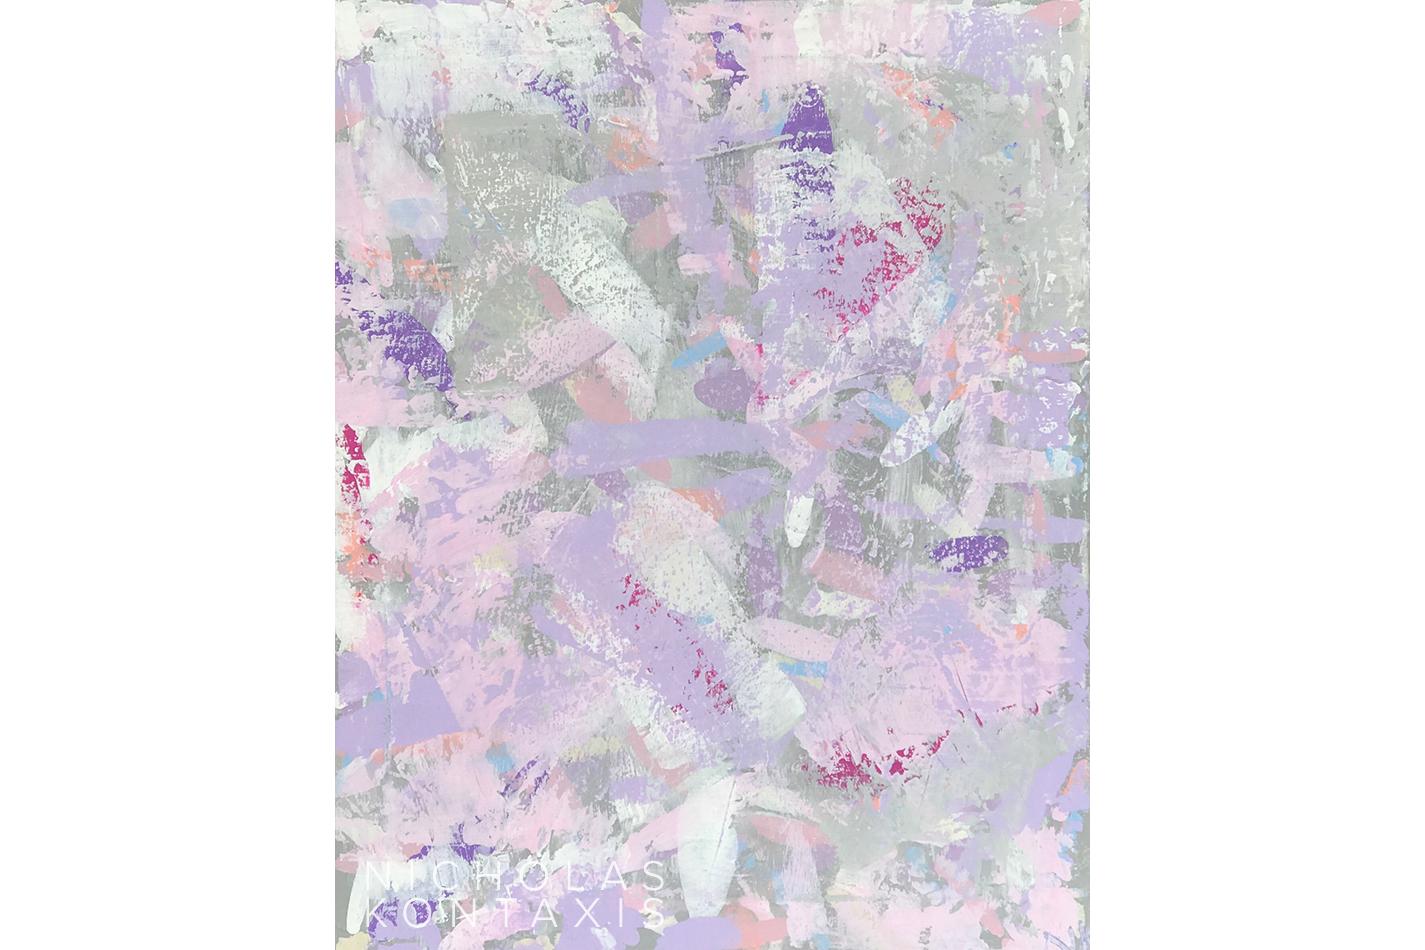 C11 Purple Diamond 16 x 20 Crop copy.jpg